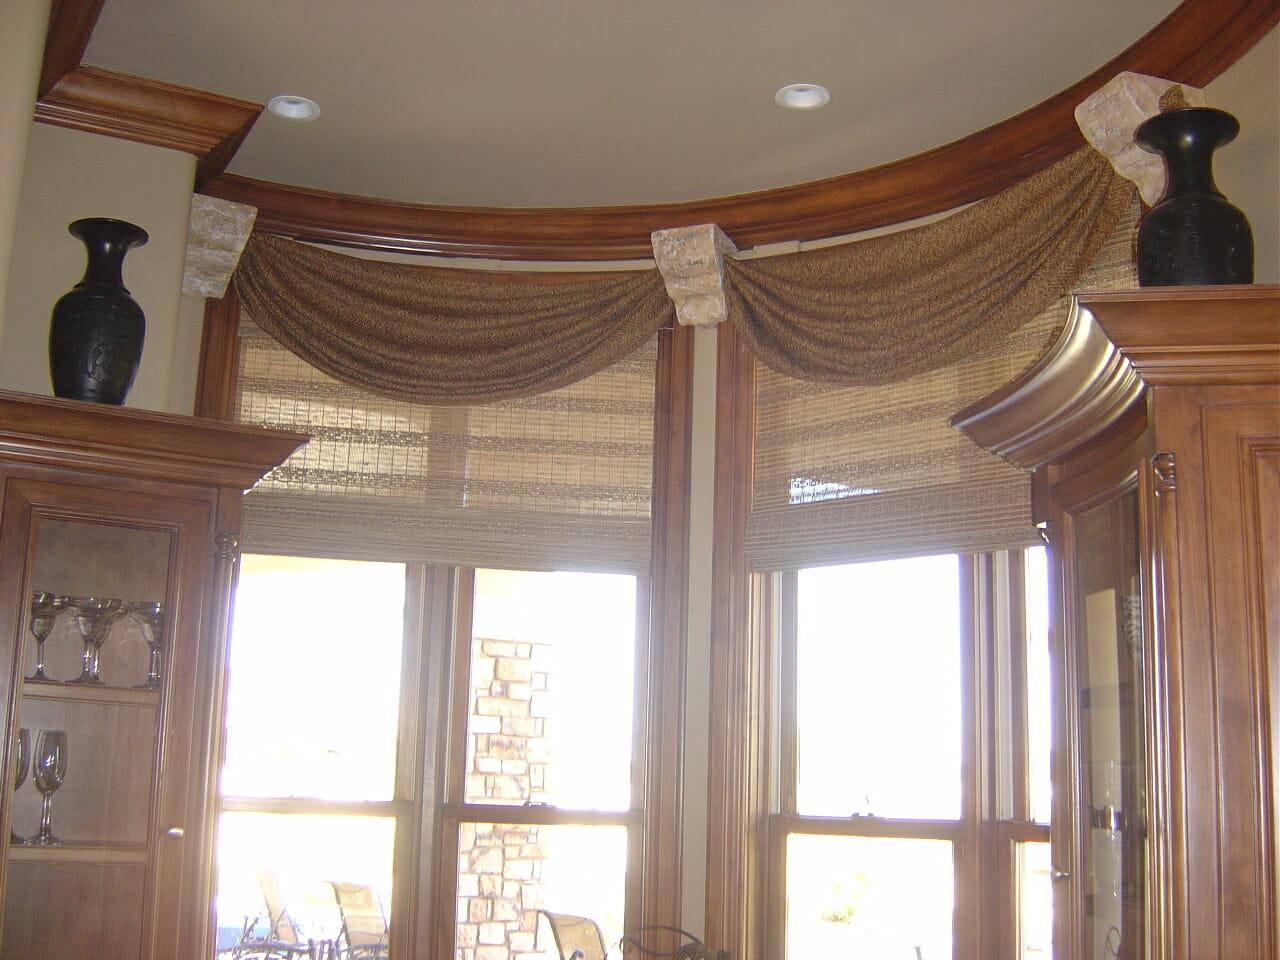 Wooden Window Valances : Woven wood shades with custom valances